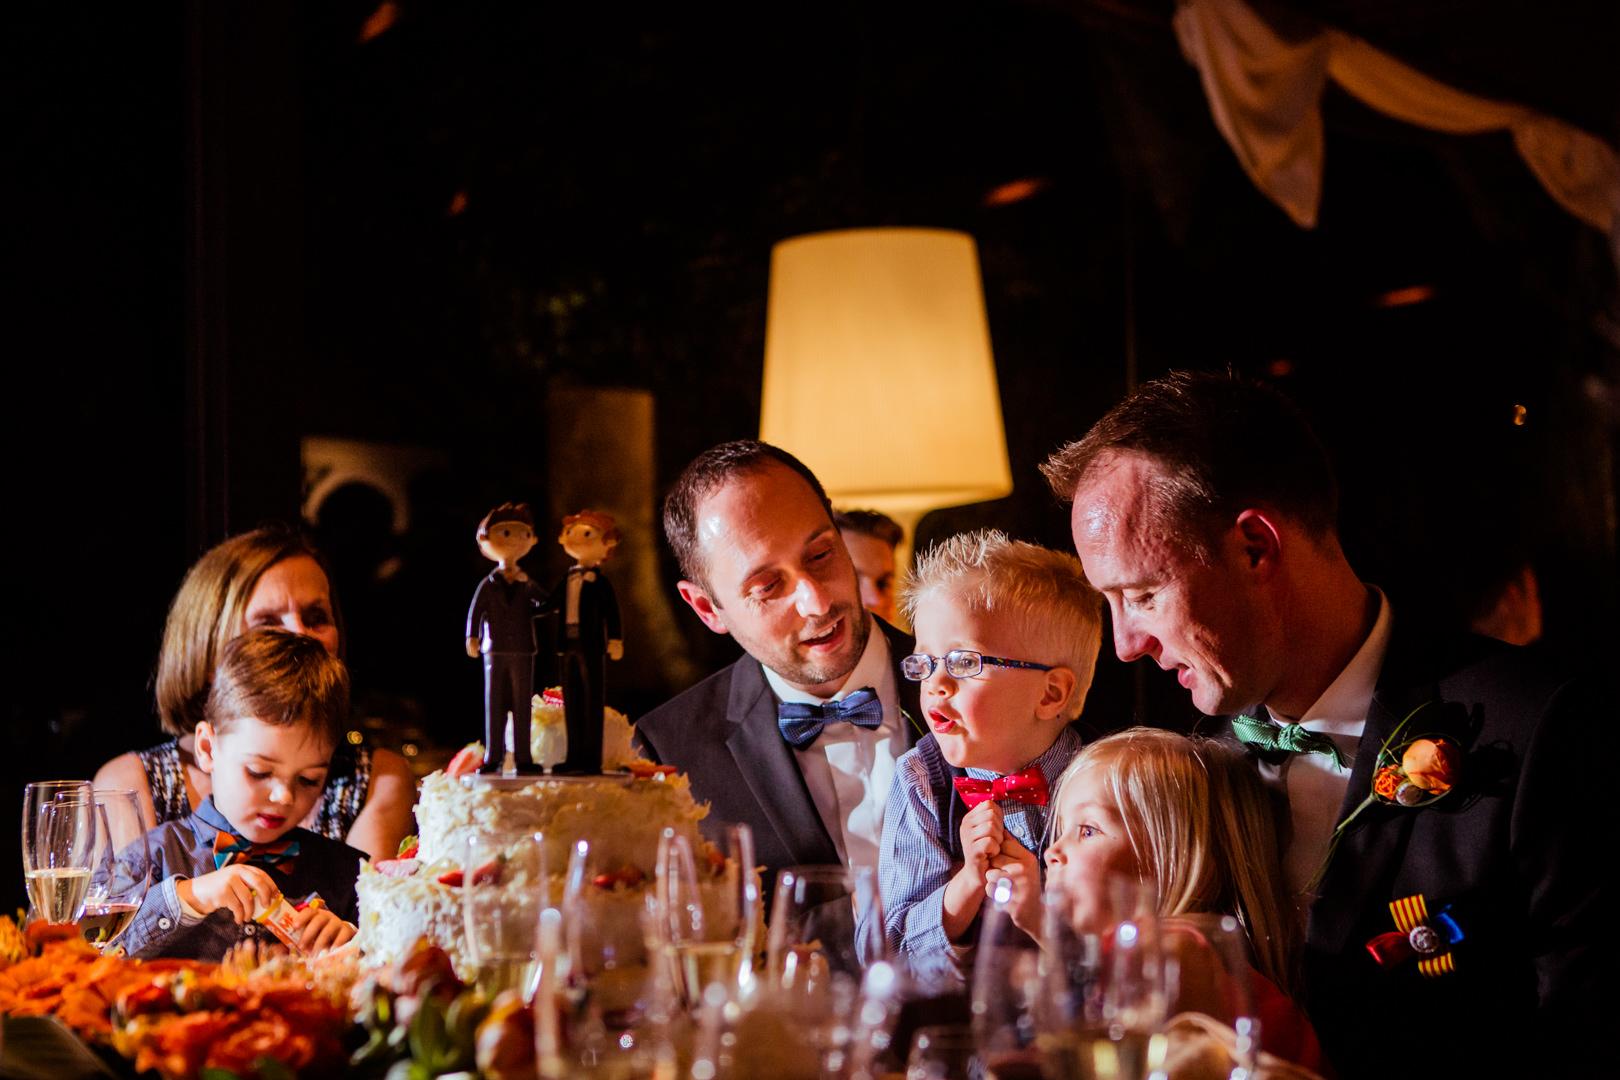 Same-sex-wedding-barcelona-boda- gay-samesex-engagement-Rafael-Torres-fotografo-bodas-sevilla-madrid-barcelona-wedding-photographer--54.jpg